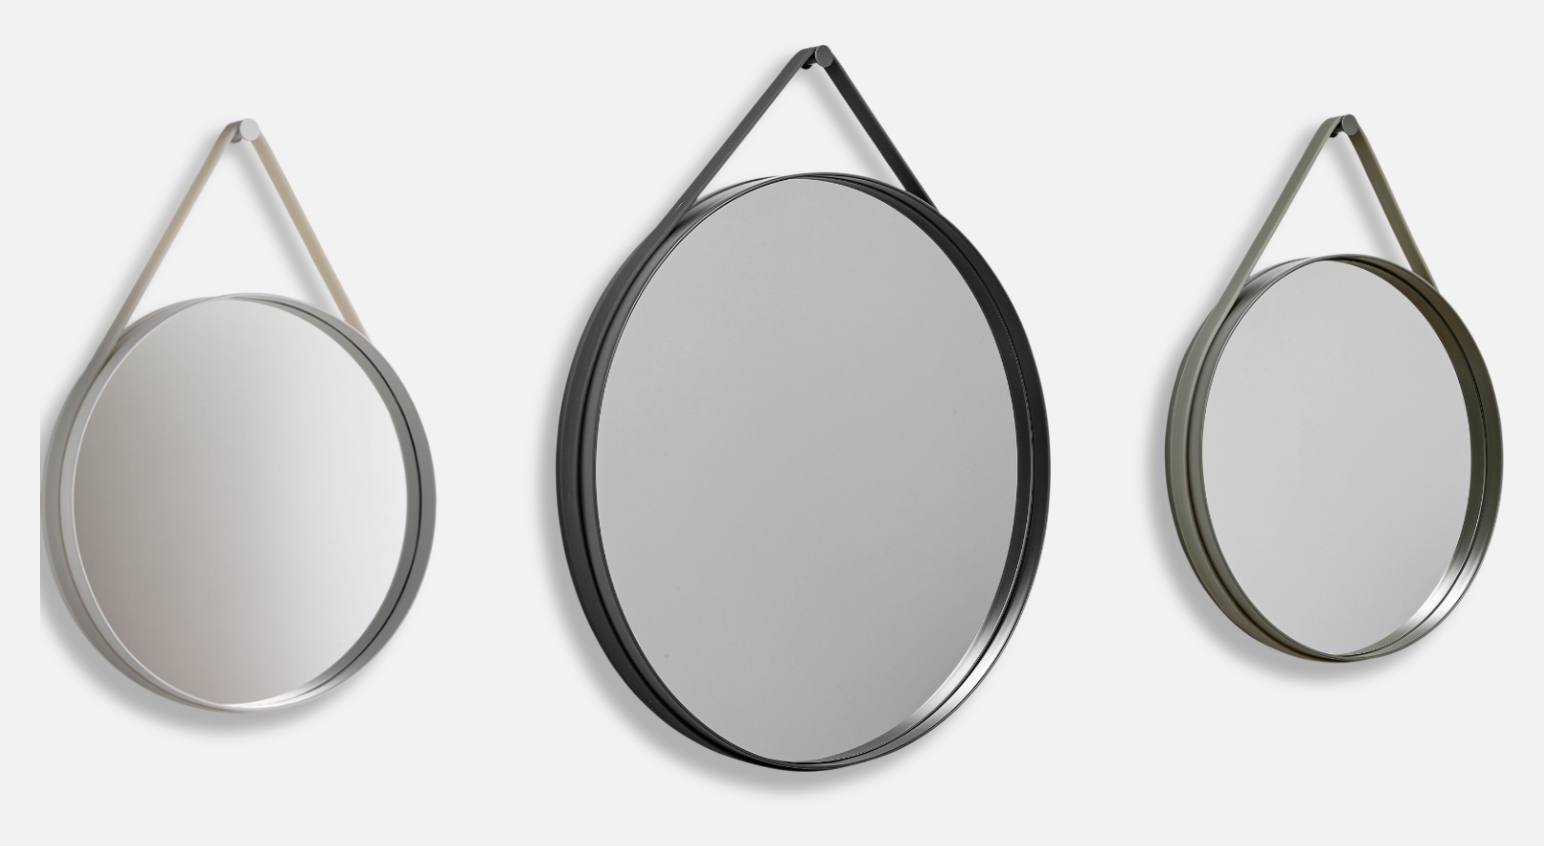 strap mirror fr n hay olsson gerthel. Black Bedroom Furniture Sets. Home Design Ideas